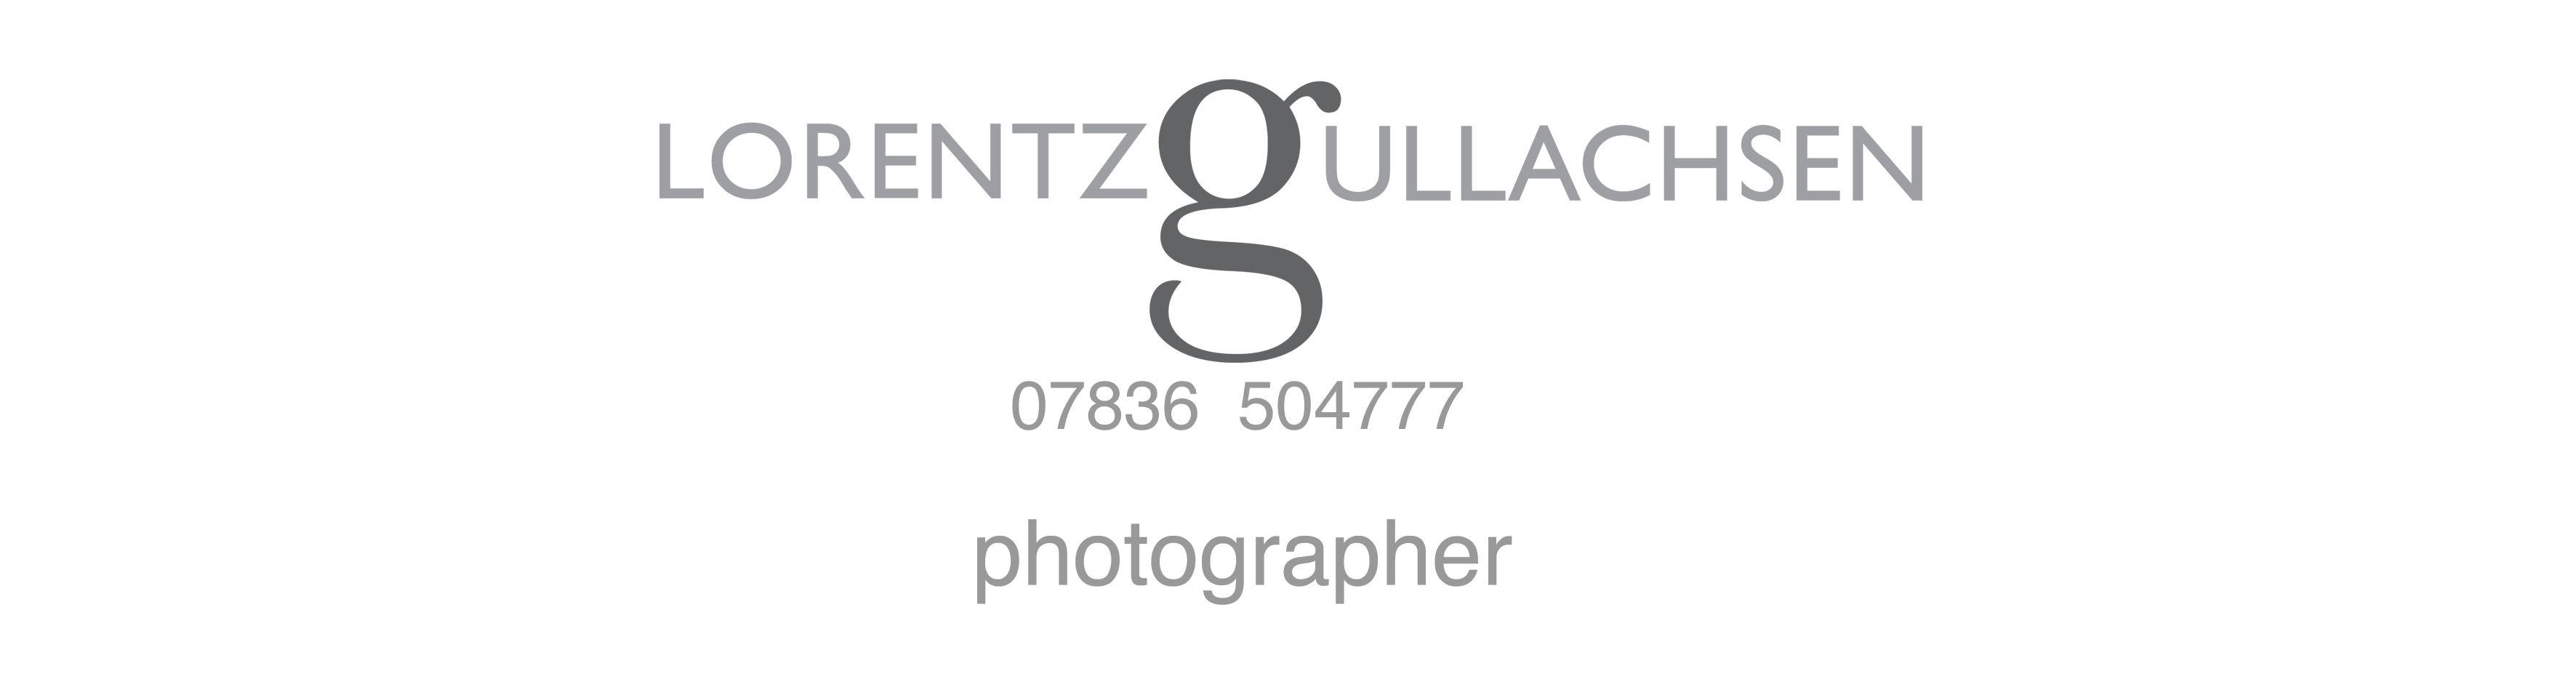 Lorentz Gullachsen Photographer